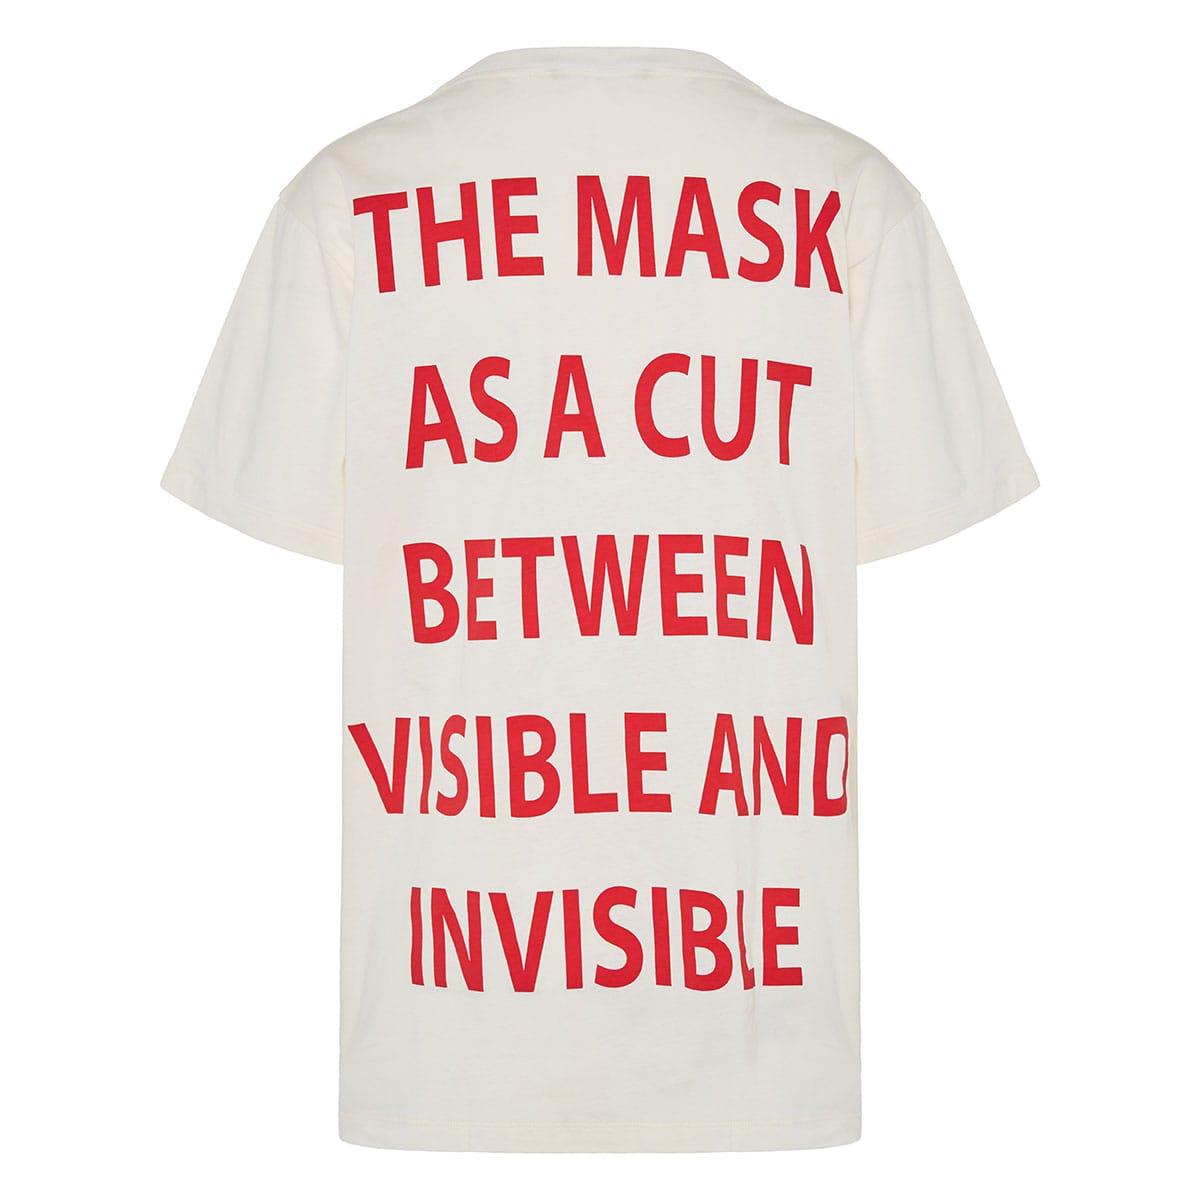 Oversized printed logo t-shirt